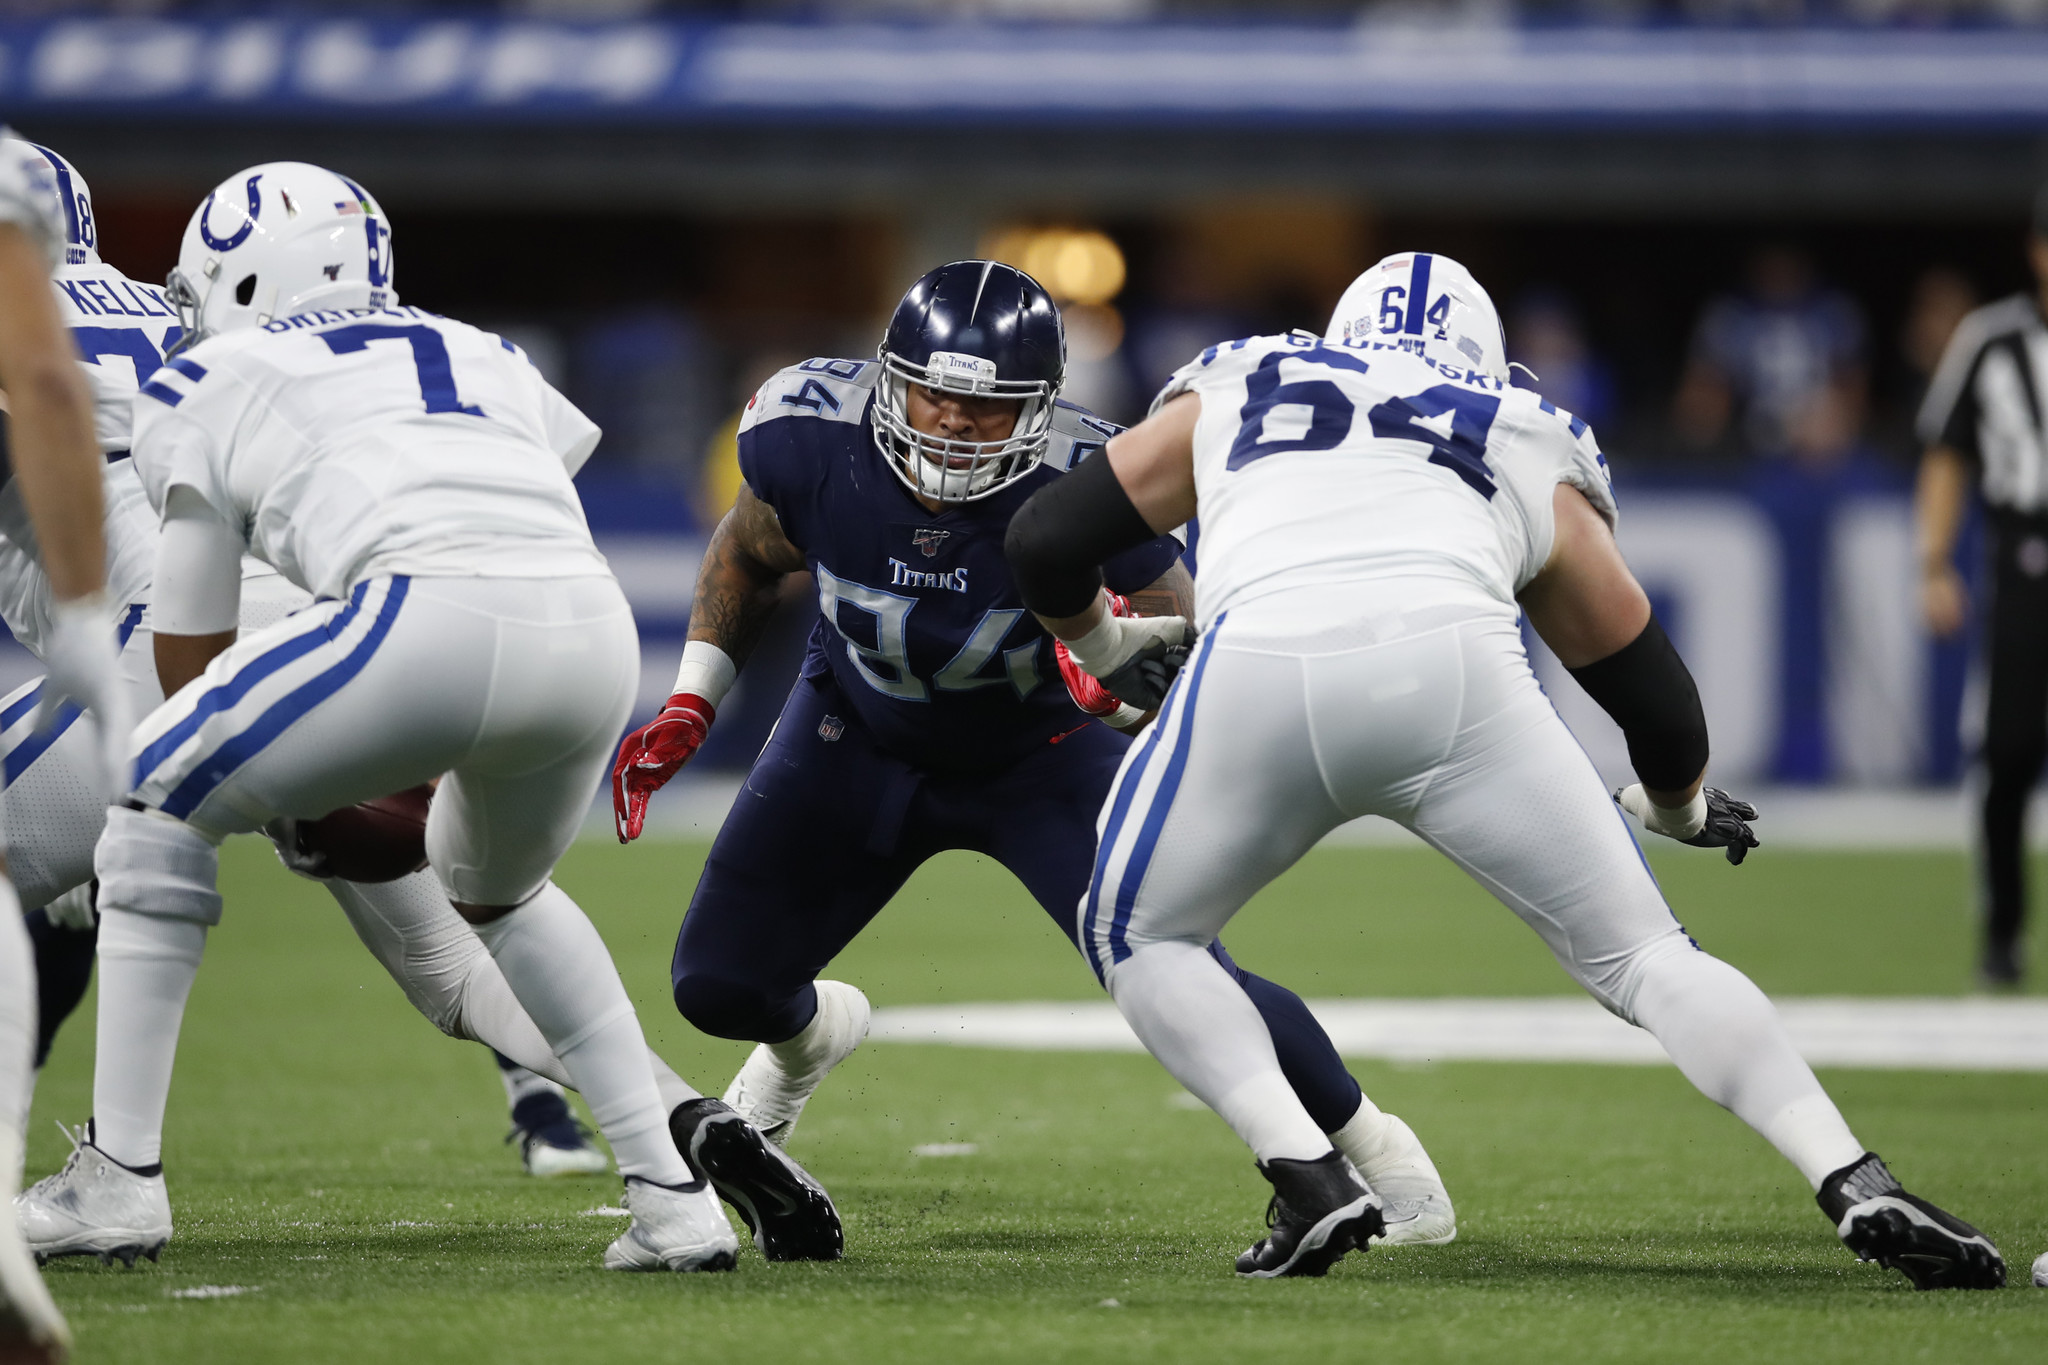 Giants add ex-Titans DT Austin Johnson for run-stopping depth on defensive line